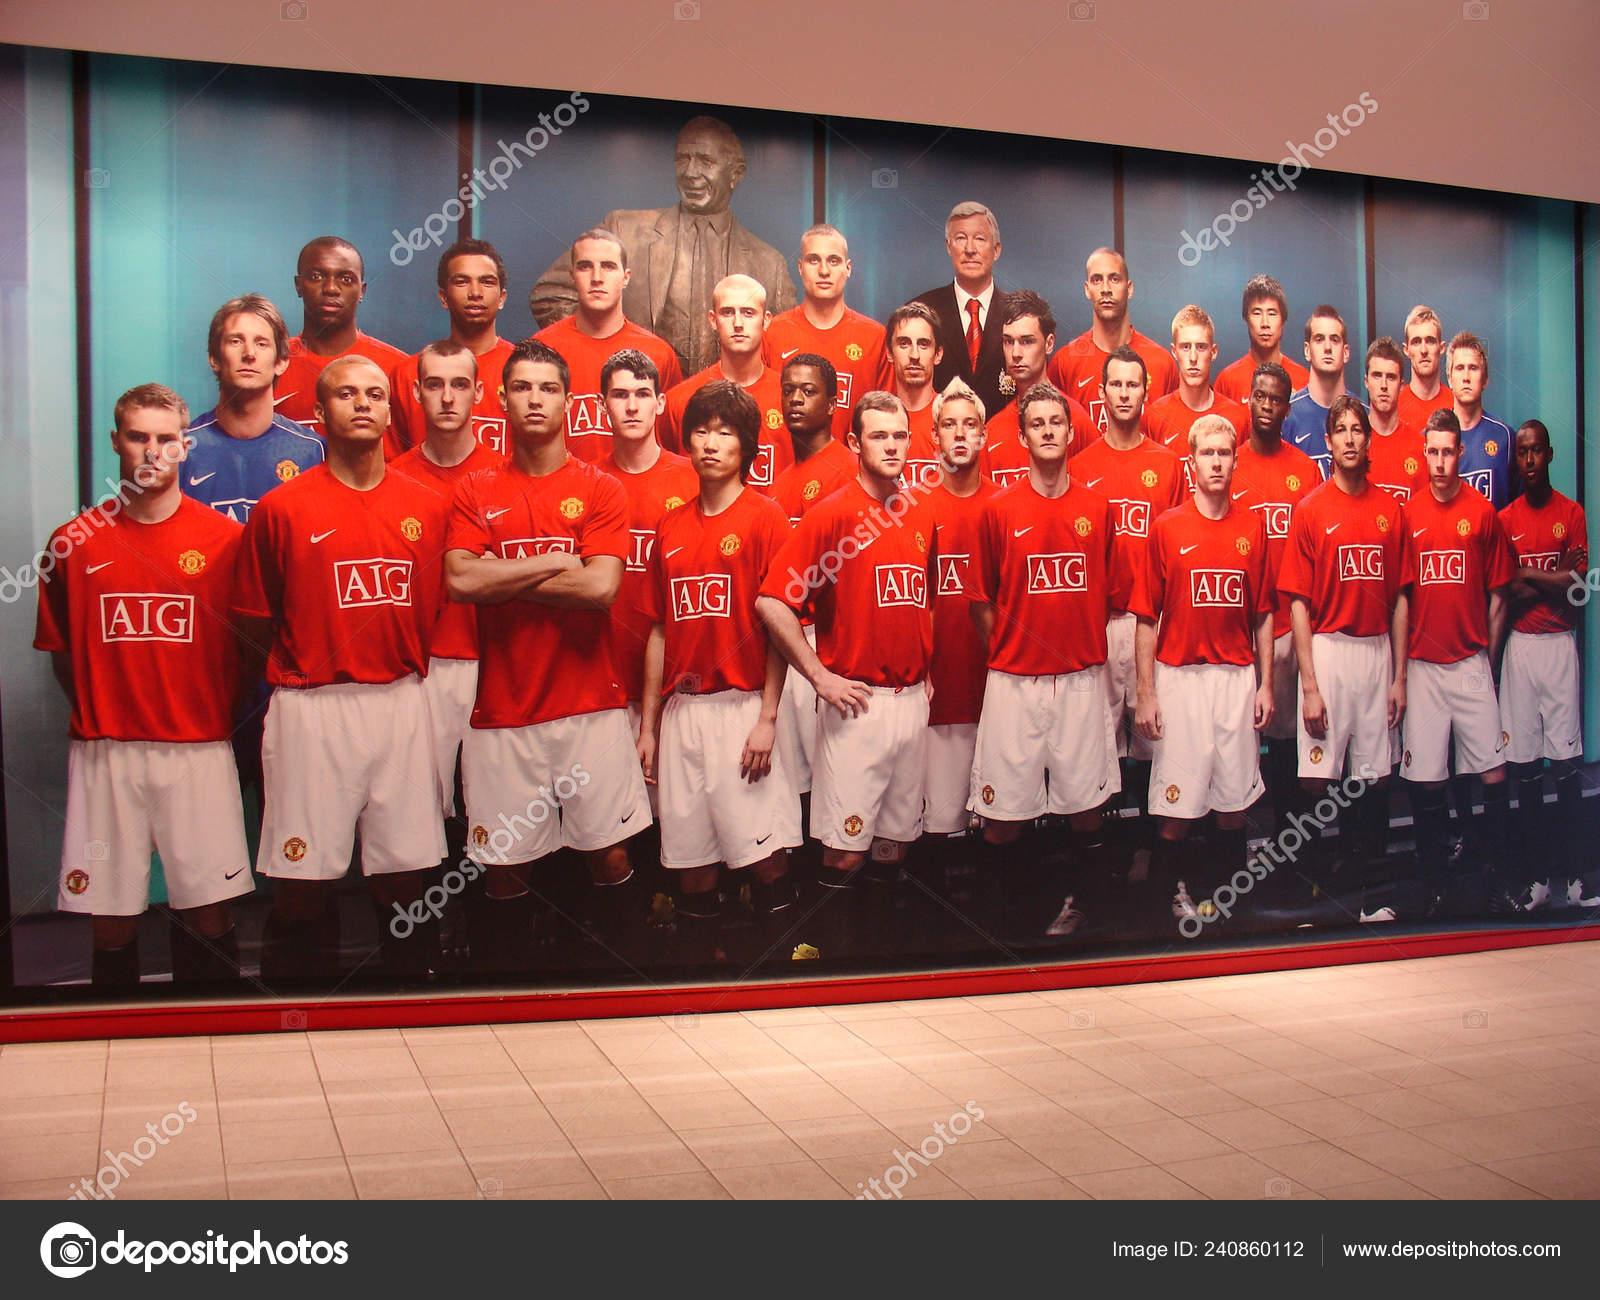 buy popular b3e16 05bc6 Manchester England September 2007 Image Football Team ...